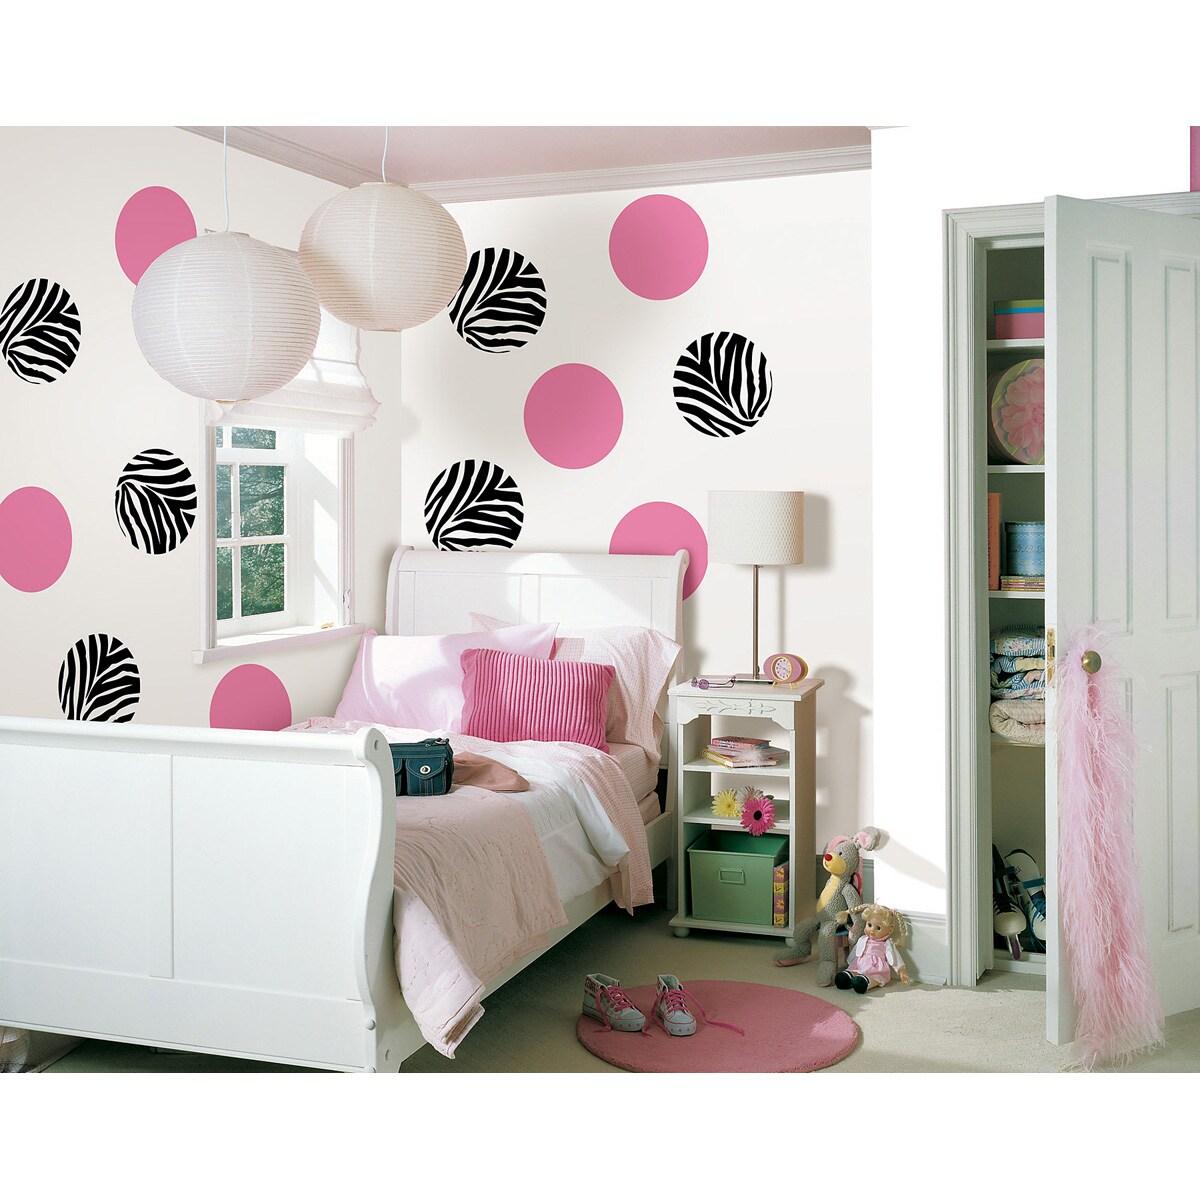 Wall Pops 'Go Wild Zebra and Flirt Pink Dots' Wall Decal Set